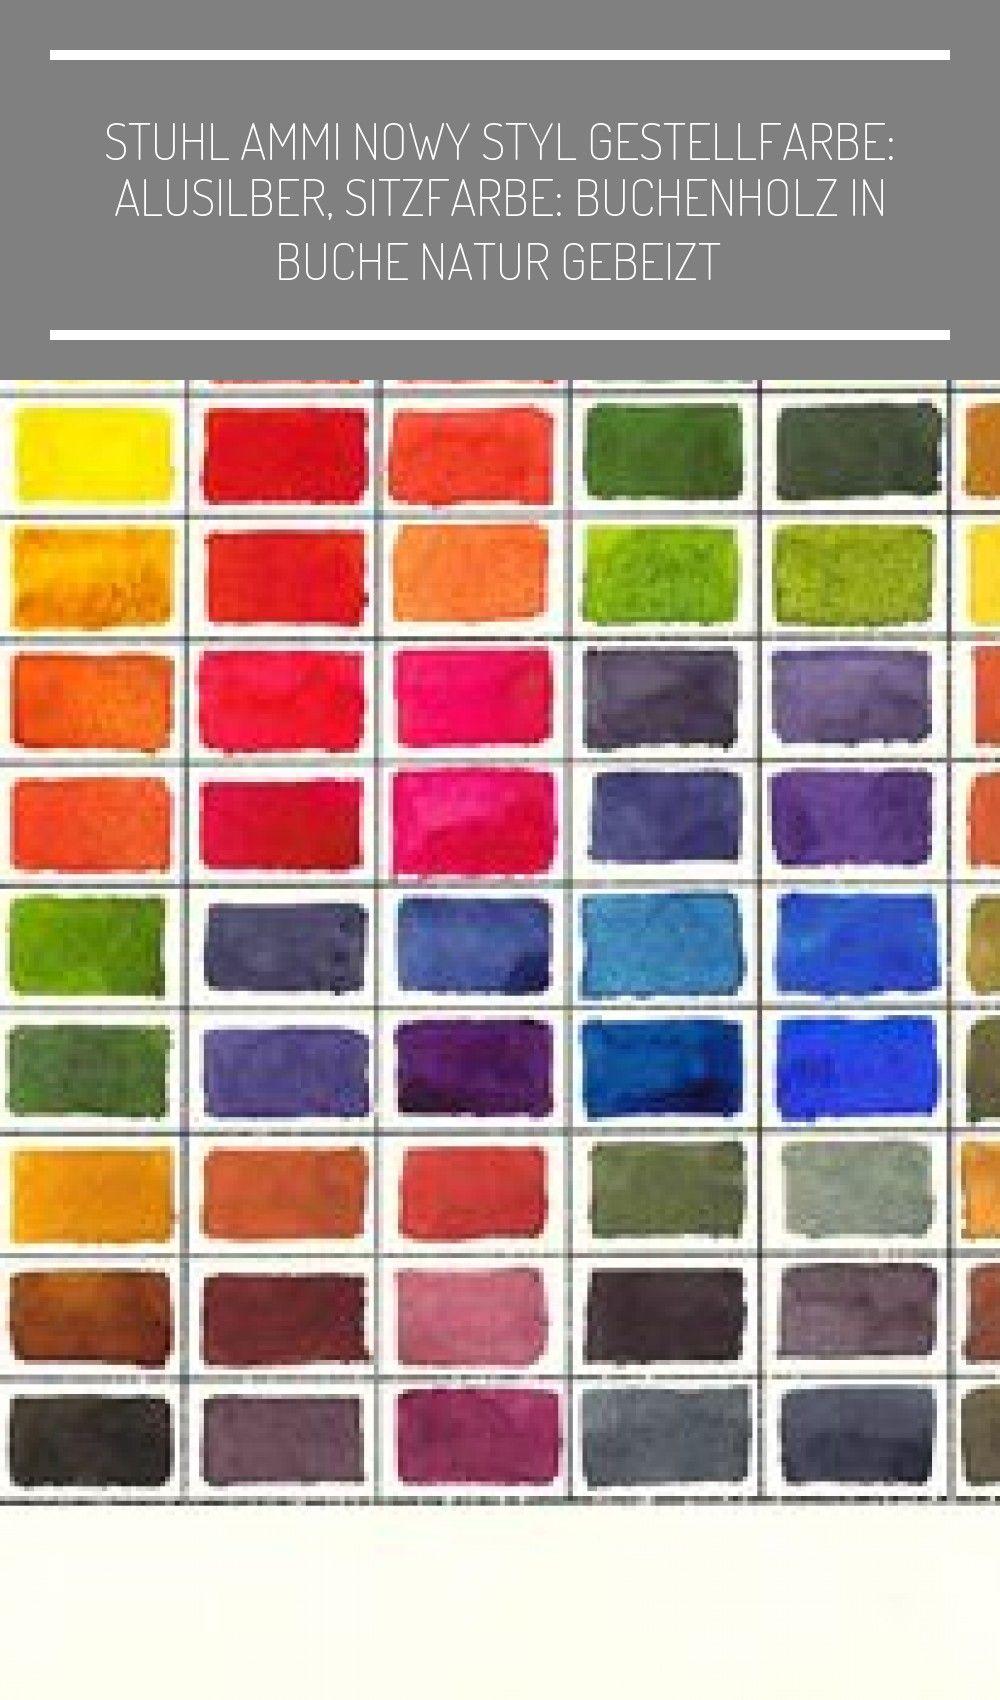 Stuhl Ammi Nowy Styl Gestellfa In 2020 Crochet Basics Basic